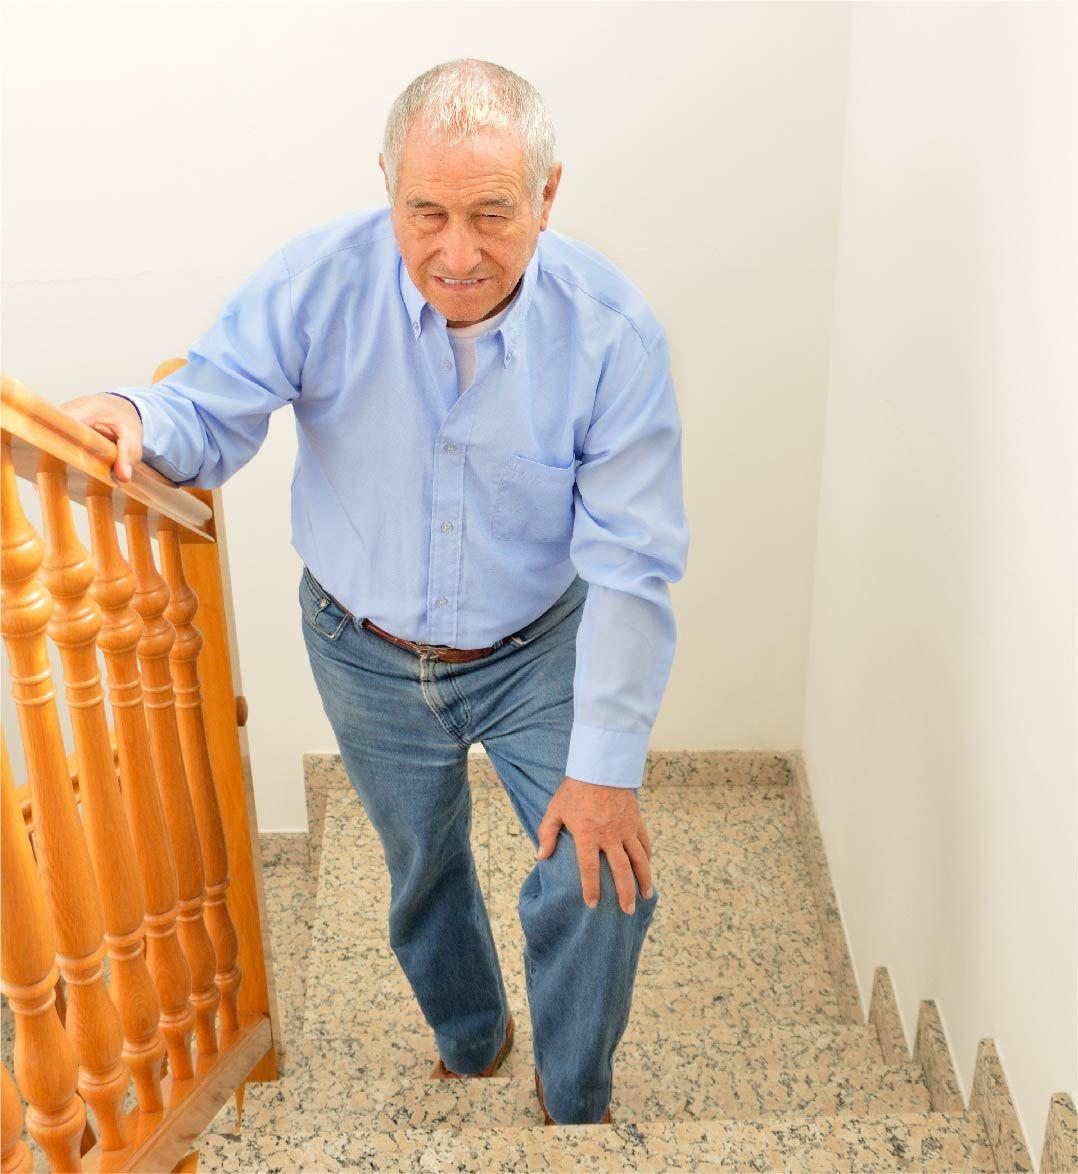 man struggling to walk up stairs